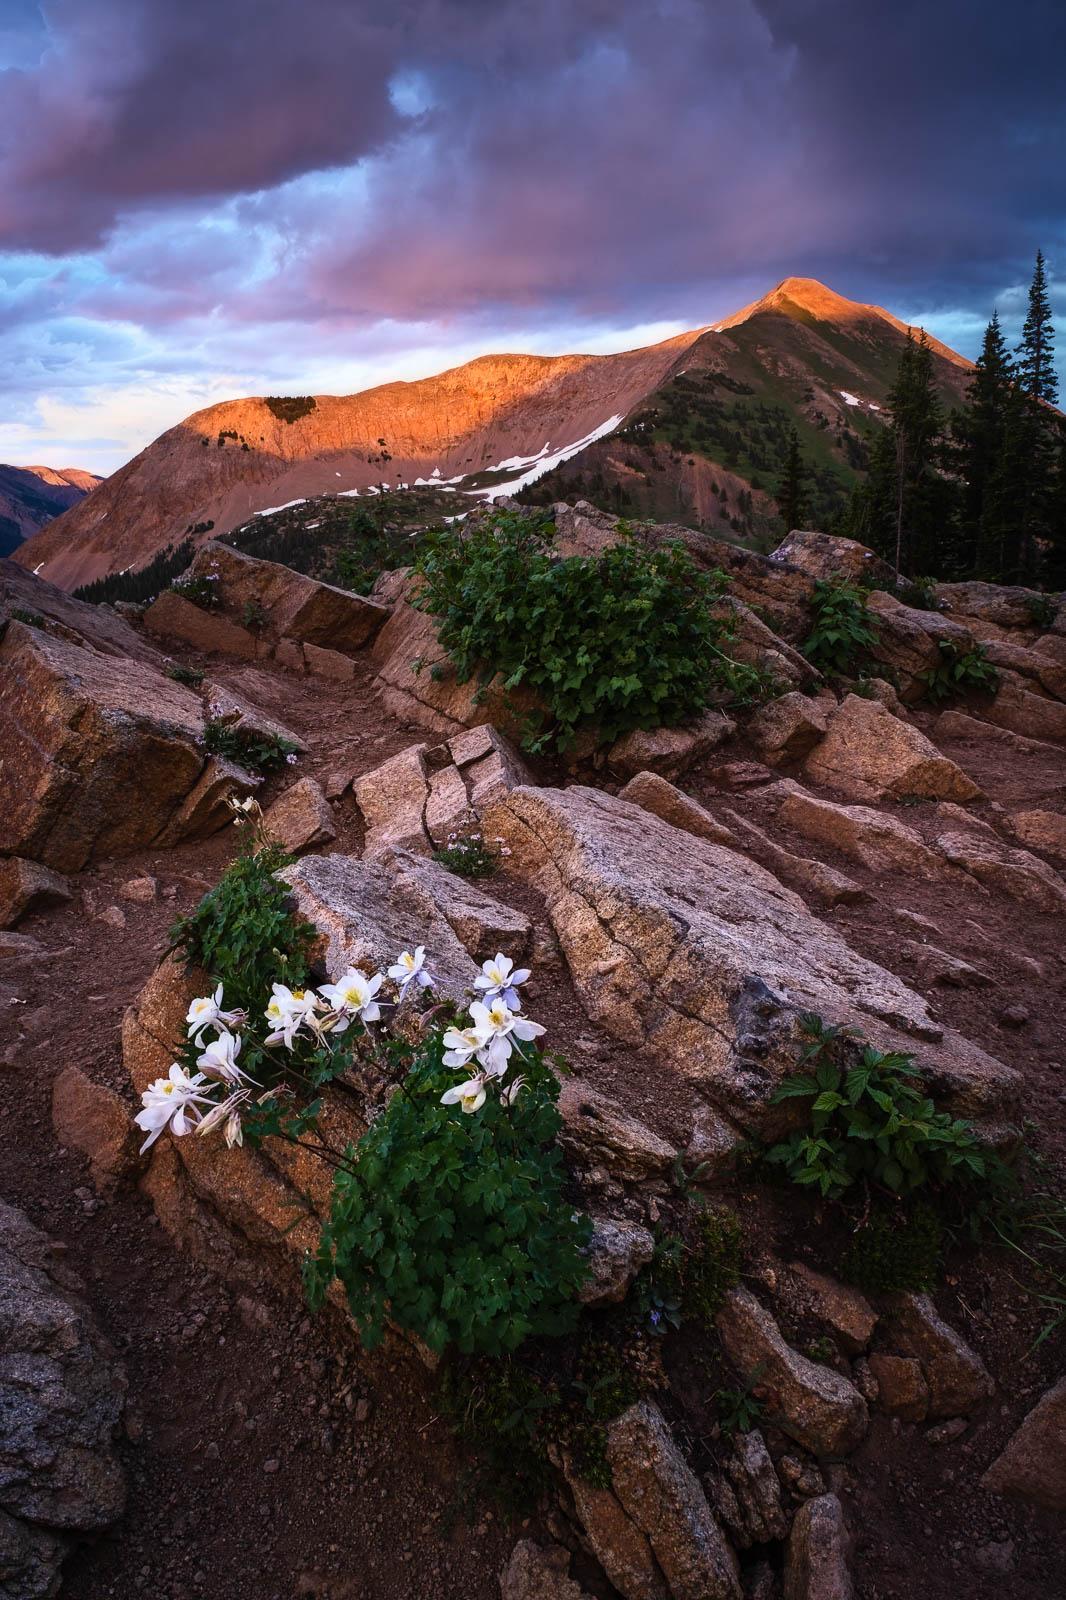 Flower, Time, Wildflower, alpine, blue, colorado, columbines, crested butte, green, orange, purple, rocky mountains, sunset